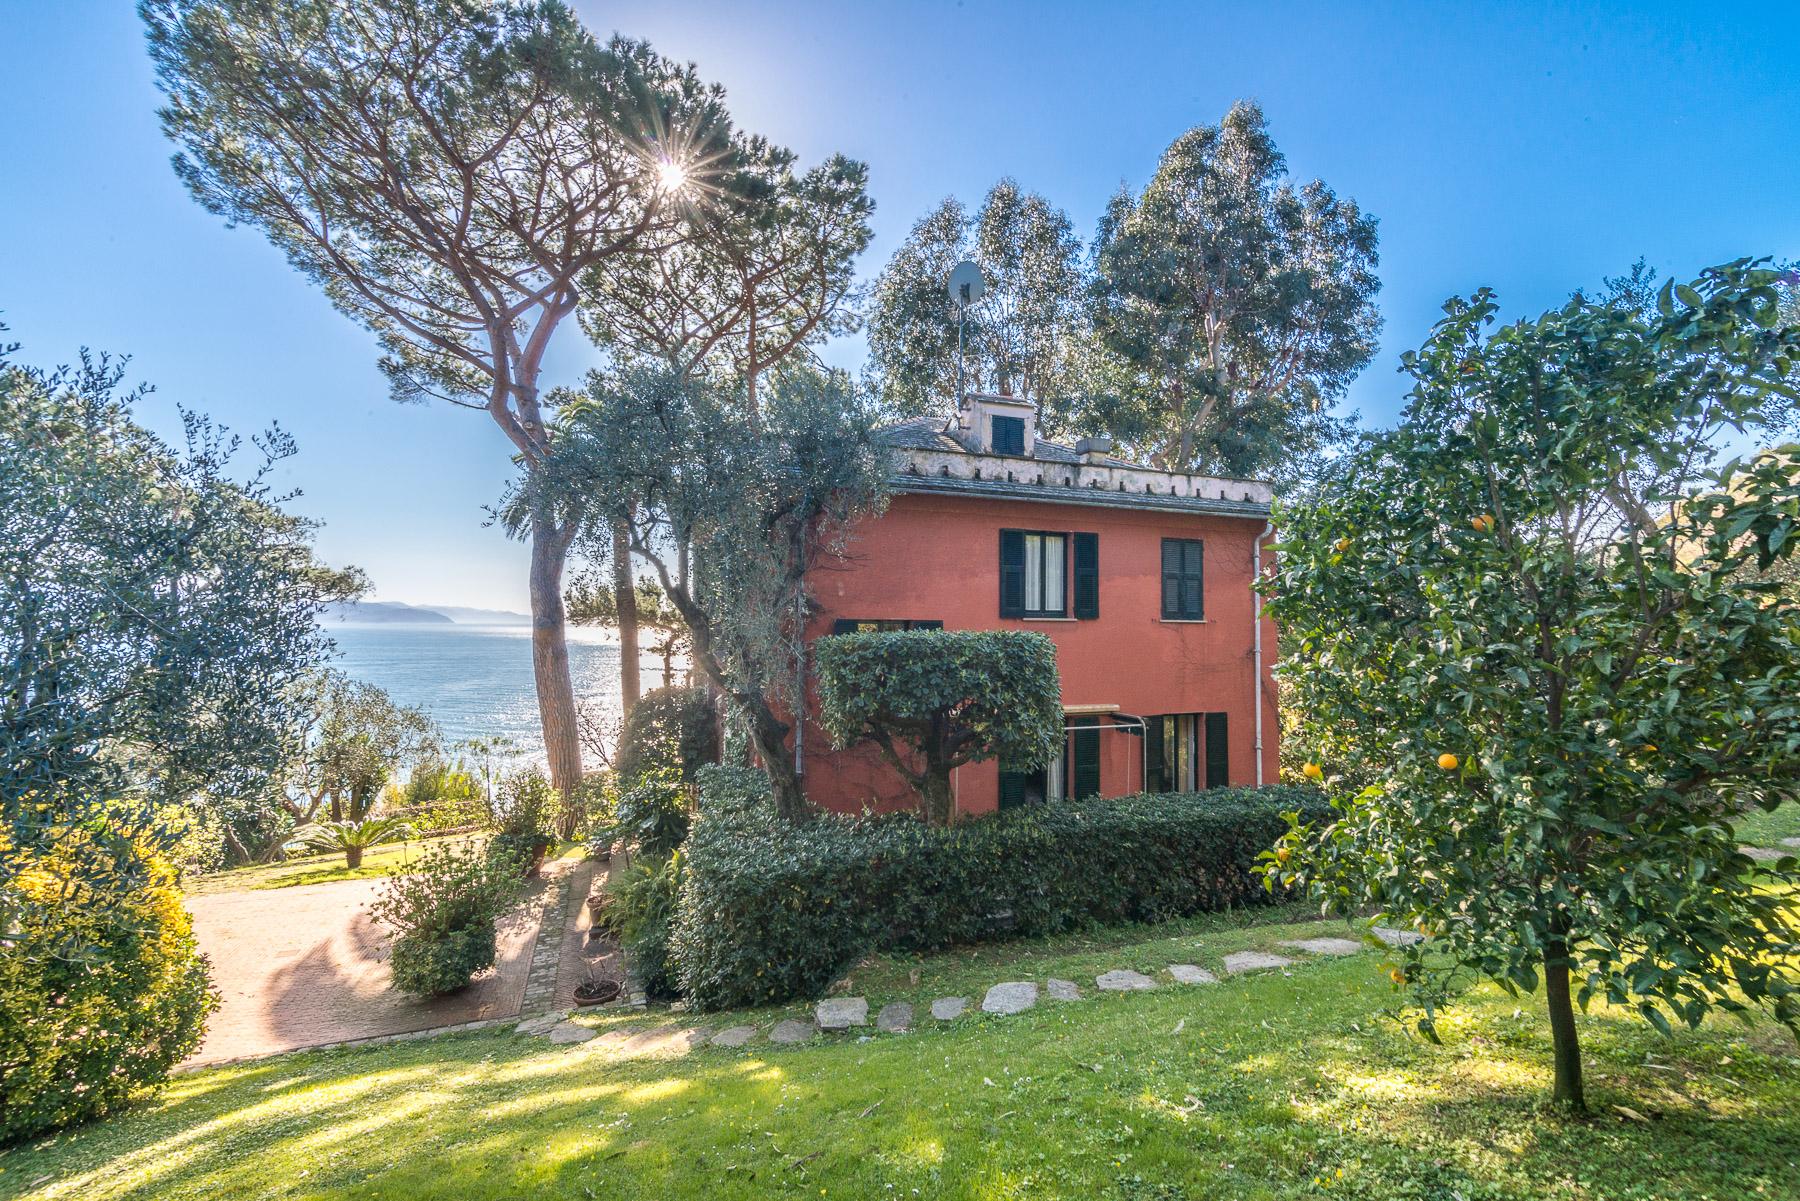 Villa in Vendita a Santa Margherita Ligure: 5 locali, 440 mq - Foto 7